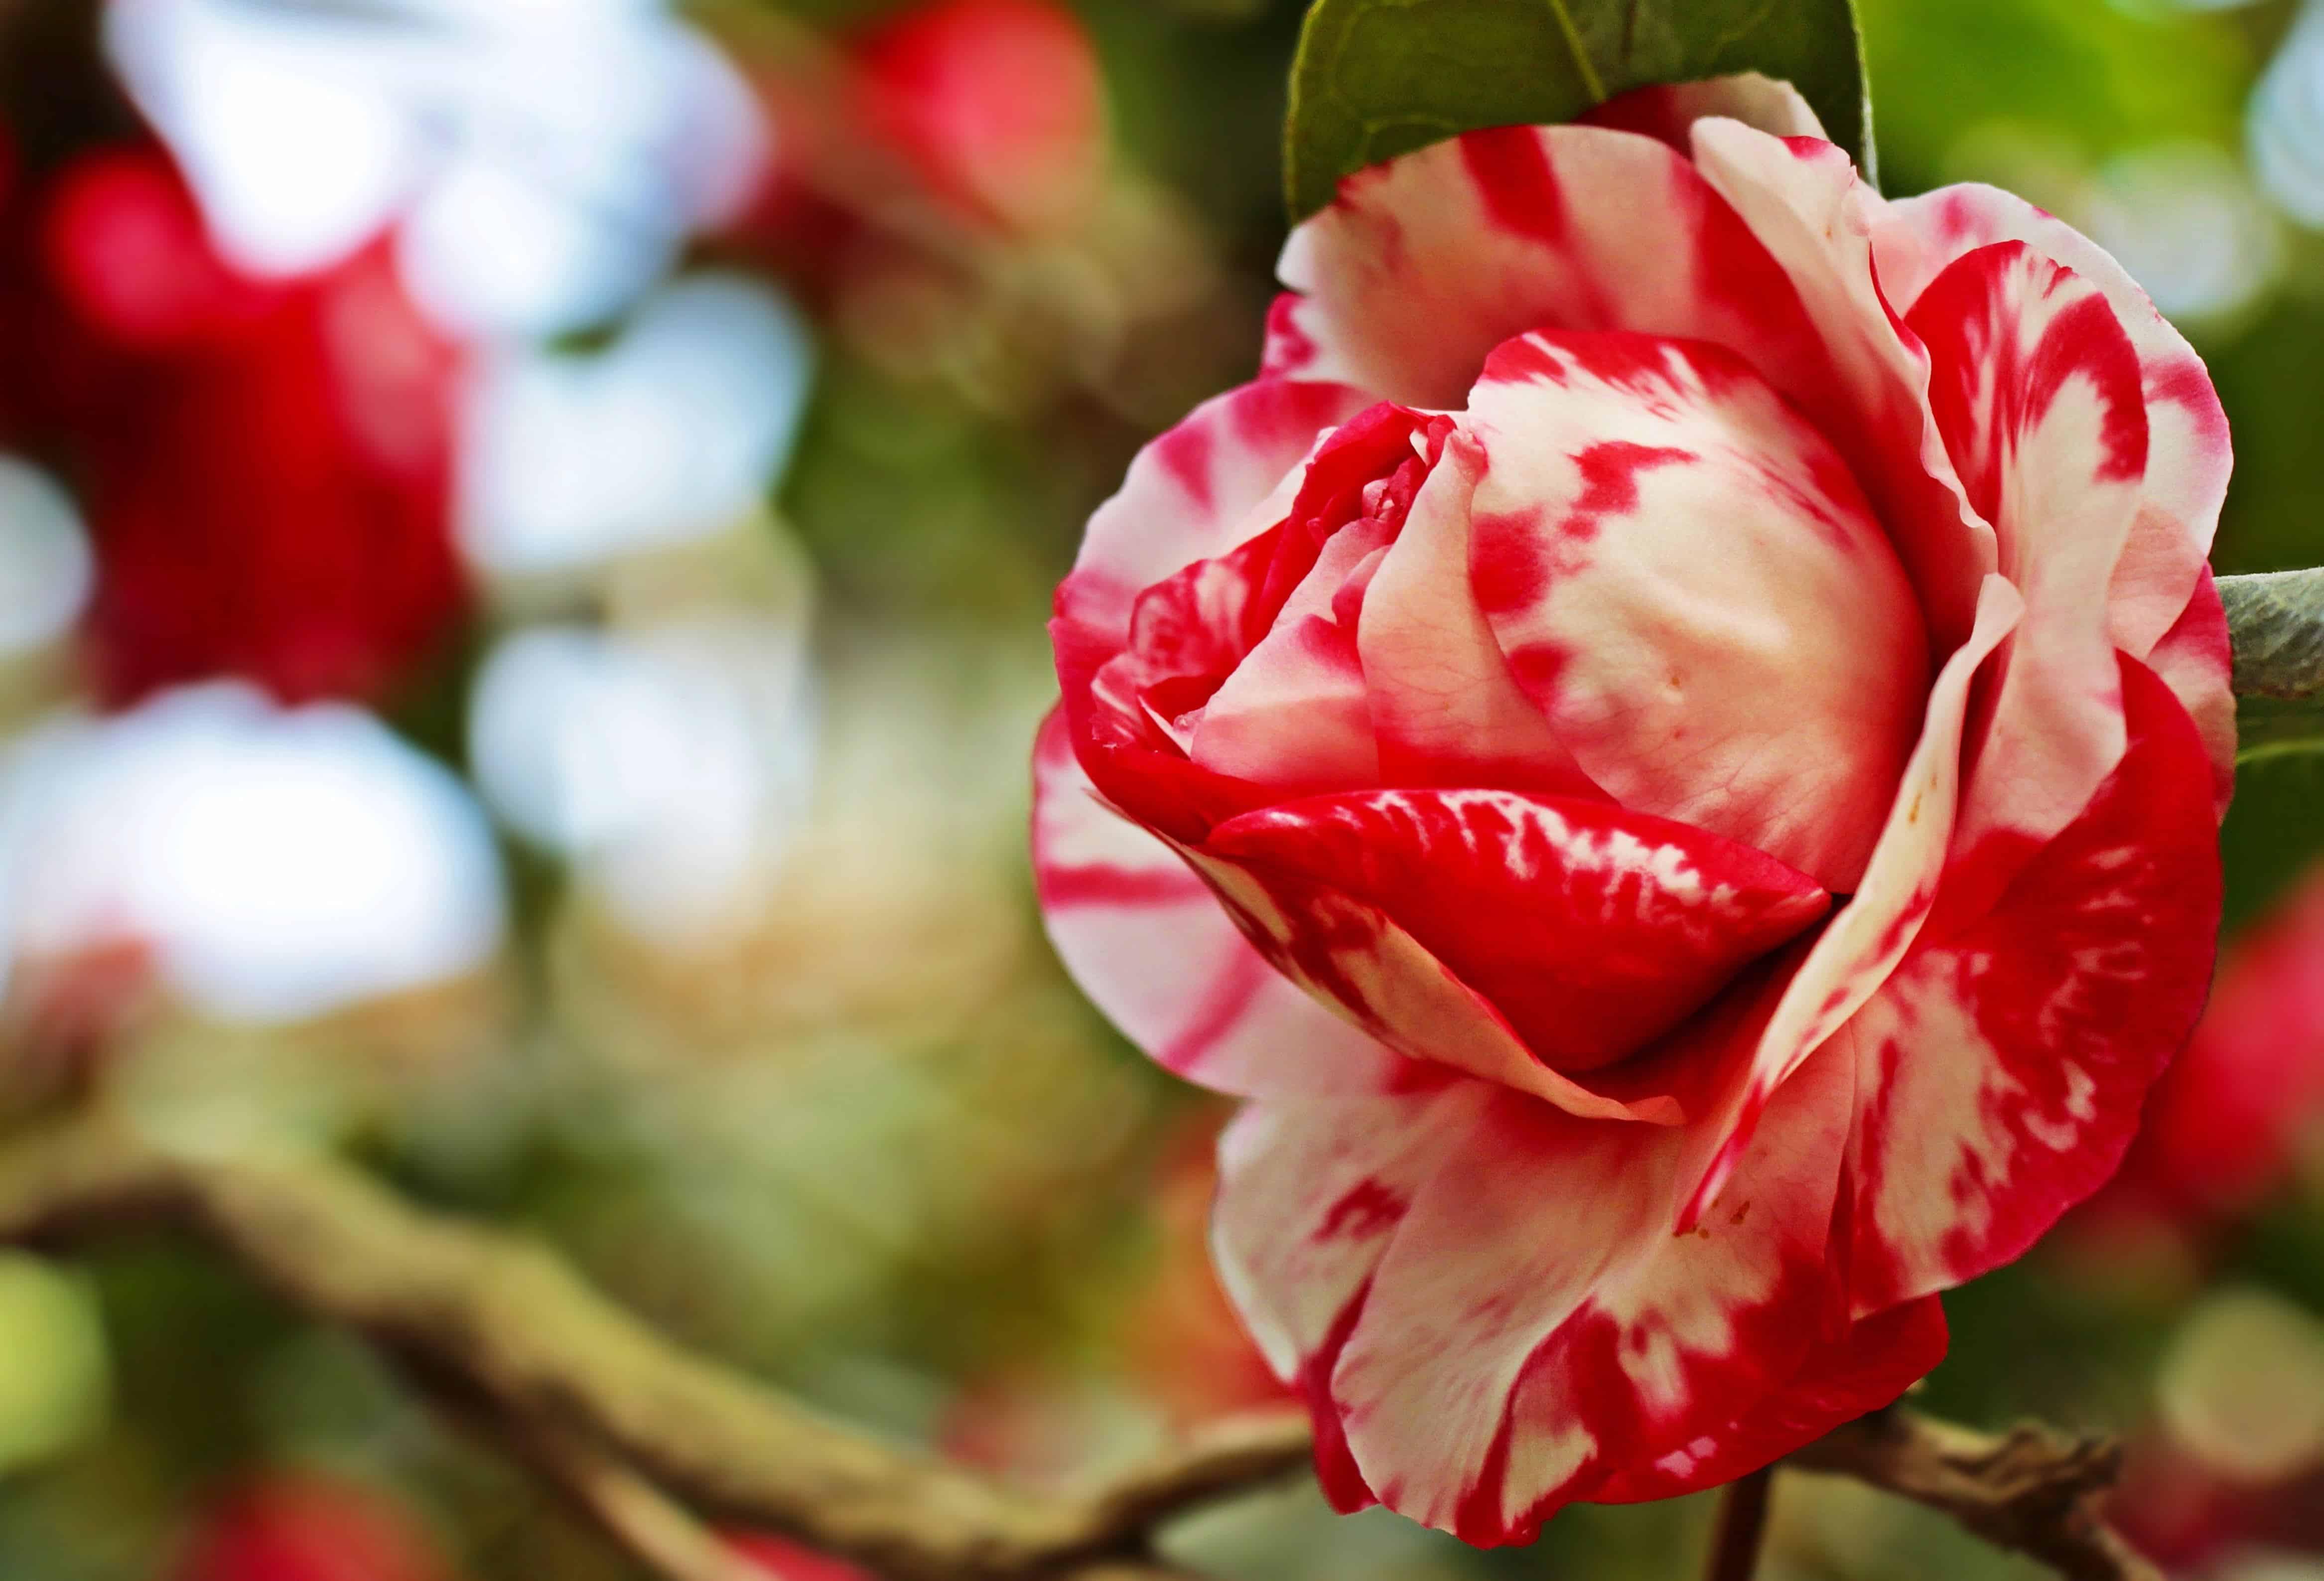 Gambar gratis sifat bunga daun bunga mawar merah